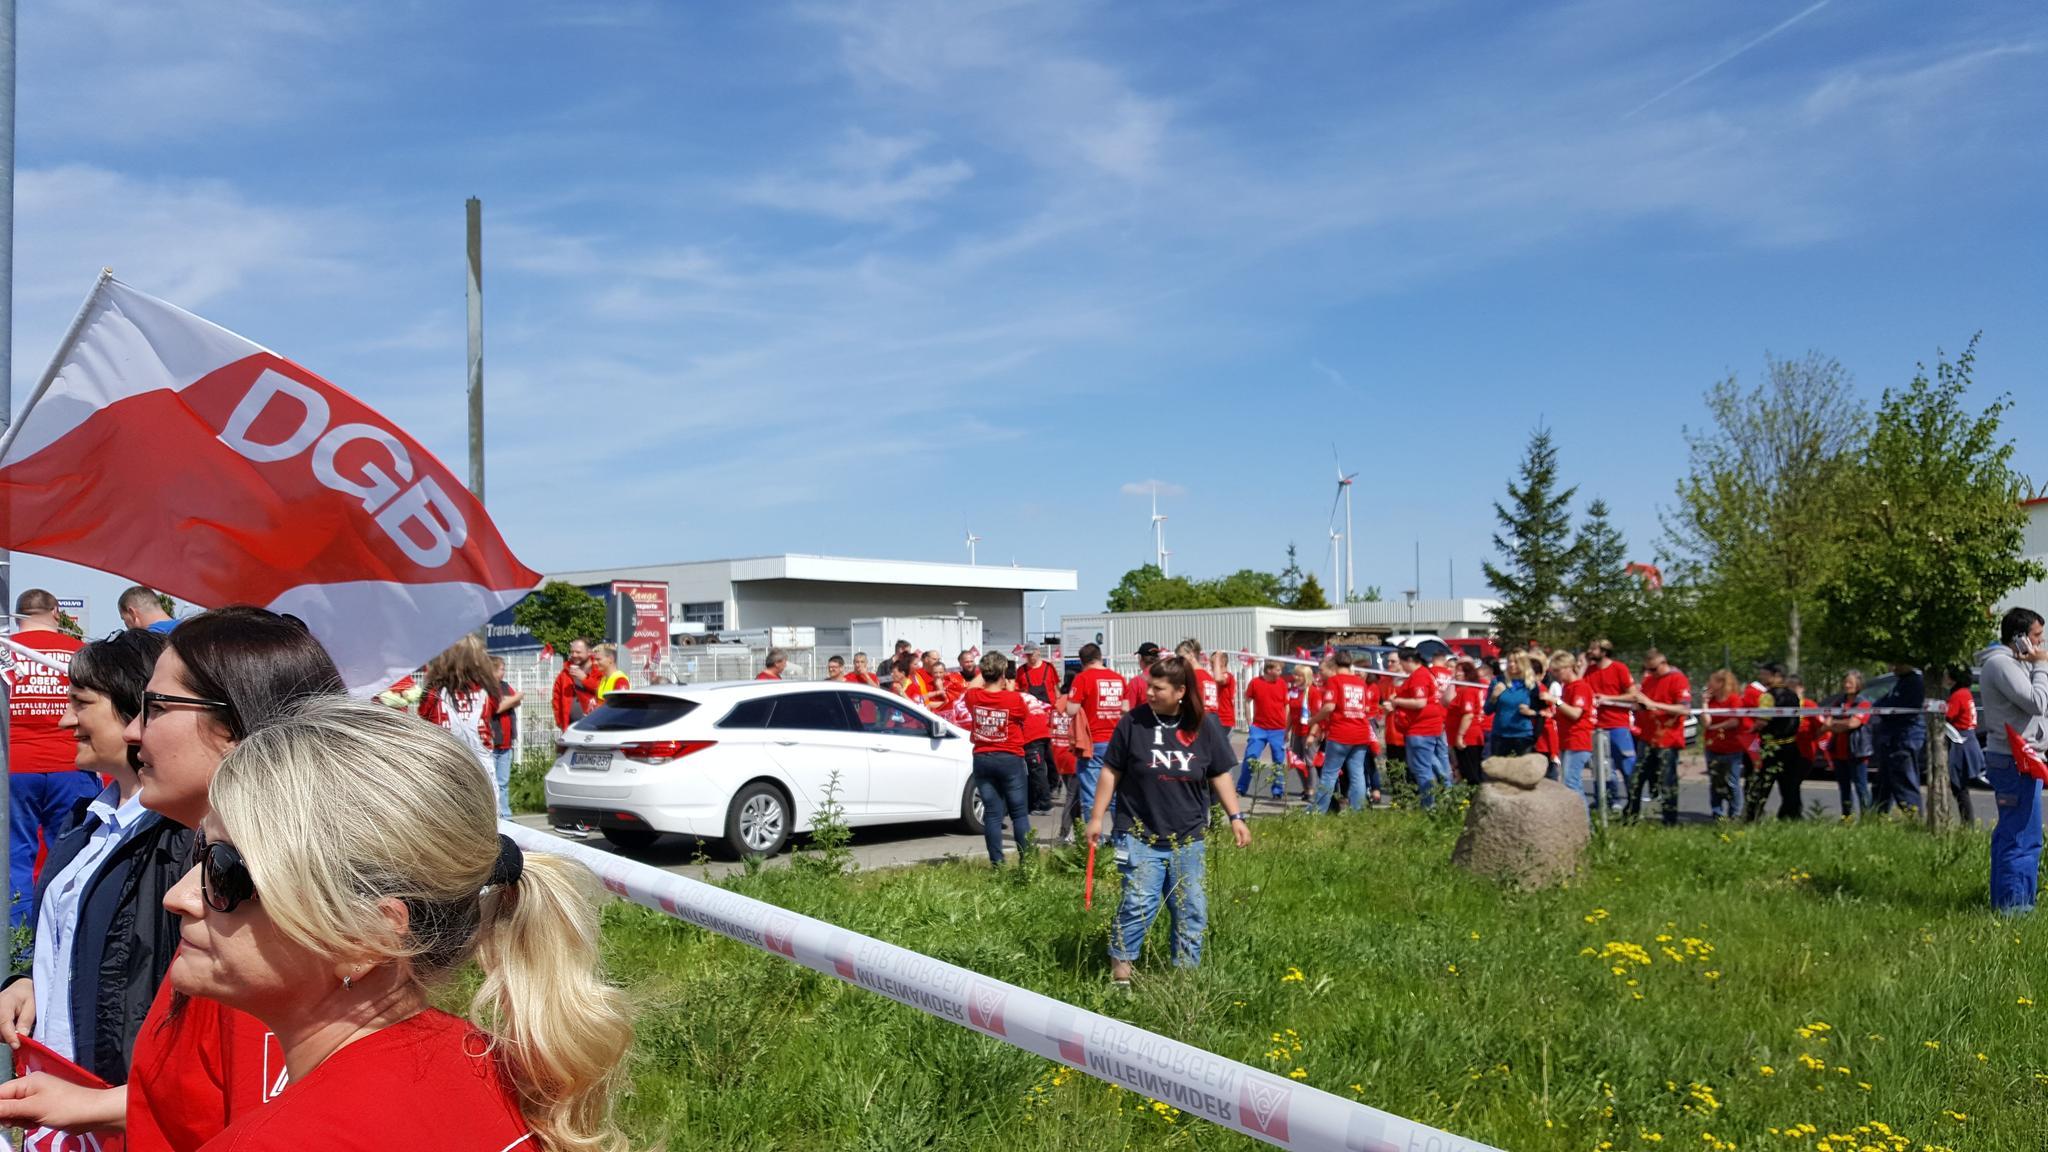 Warnstreik bei Boryscew in Prenzlau